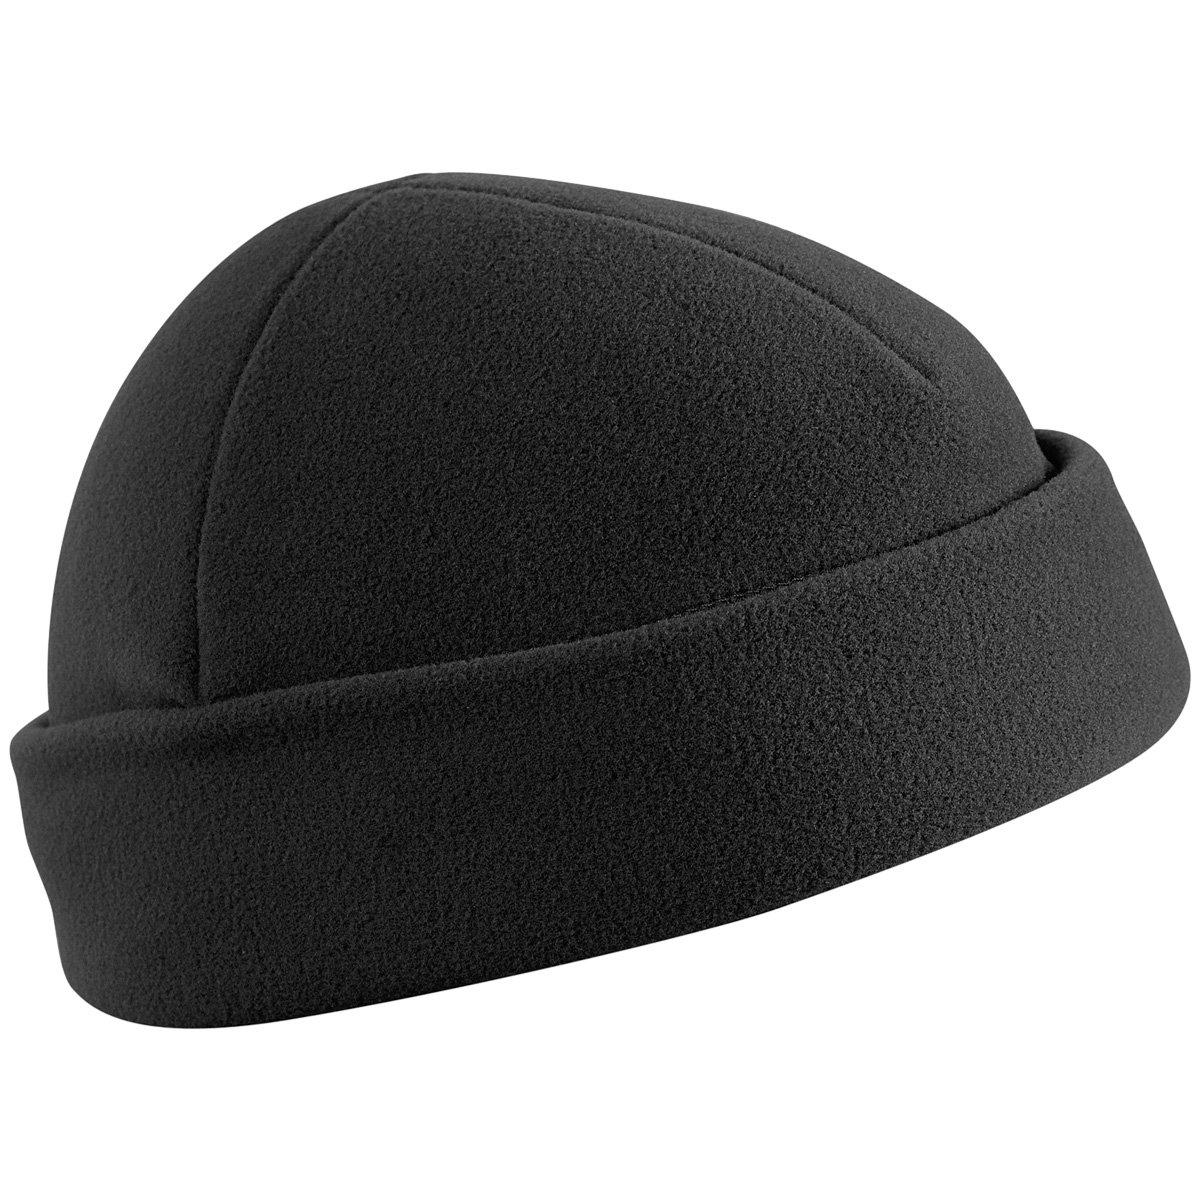 926ac43ee3c Commando Watch Cap Docker Hat Work Beanie Helikon Black  Amazon.co.uk   Clothing